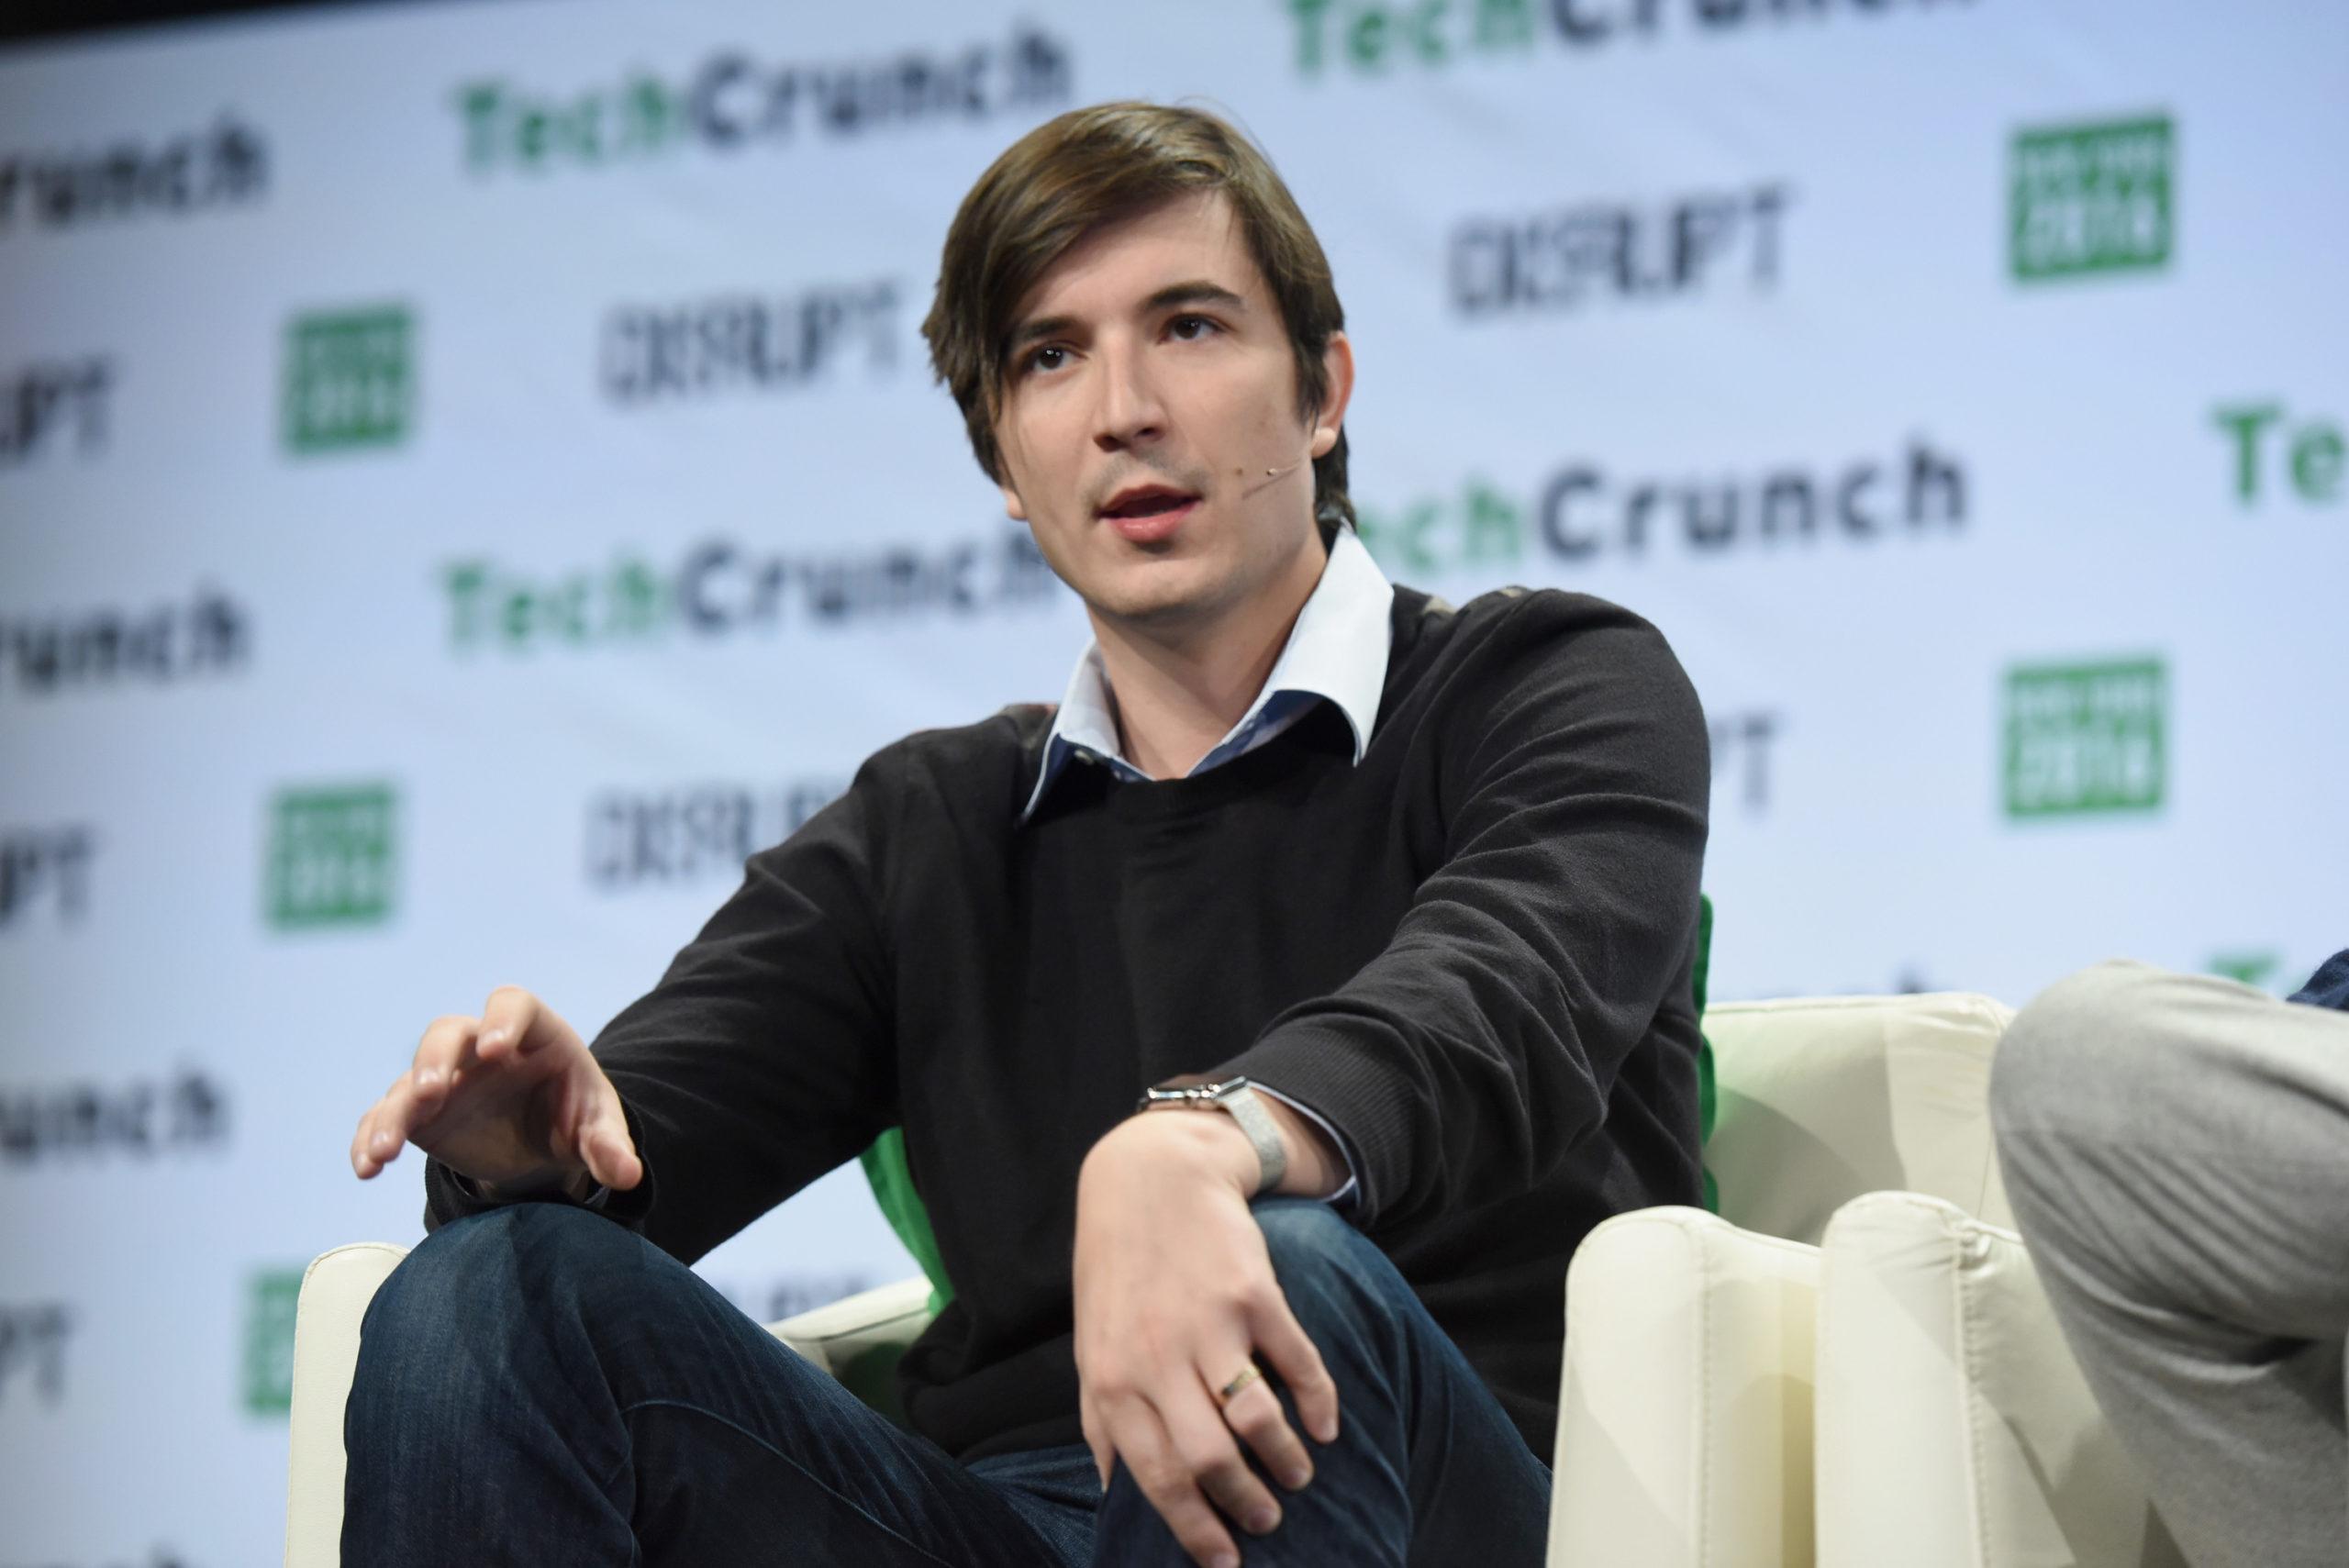 CEO of Robinhood Vlad Tenev speaks in 2016. (Noam Galai/Getty Images for TechCrunch)